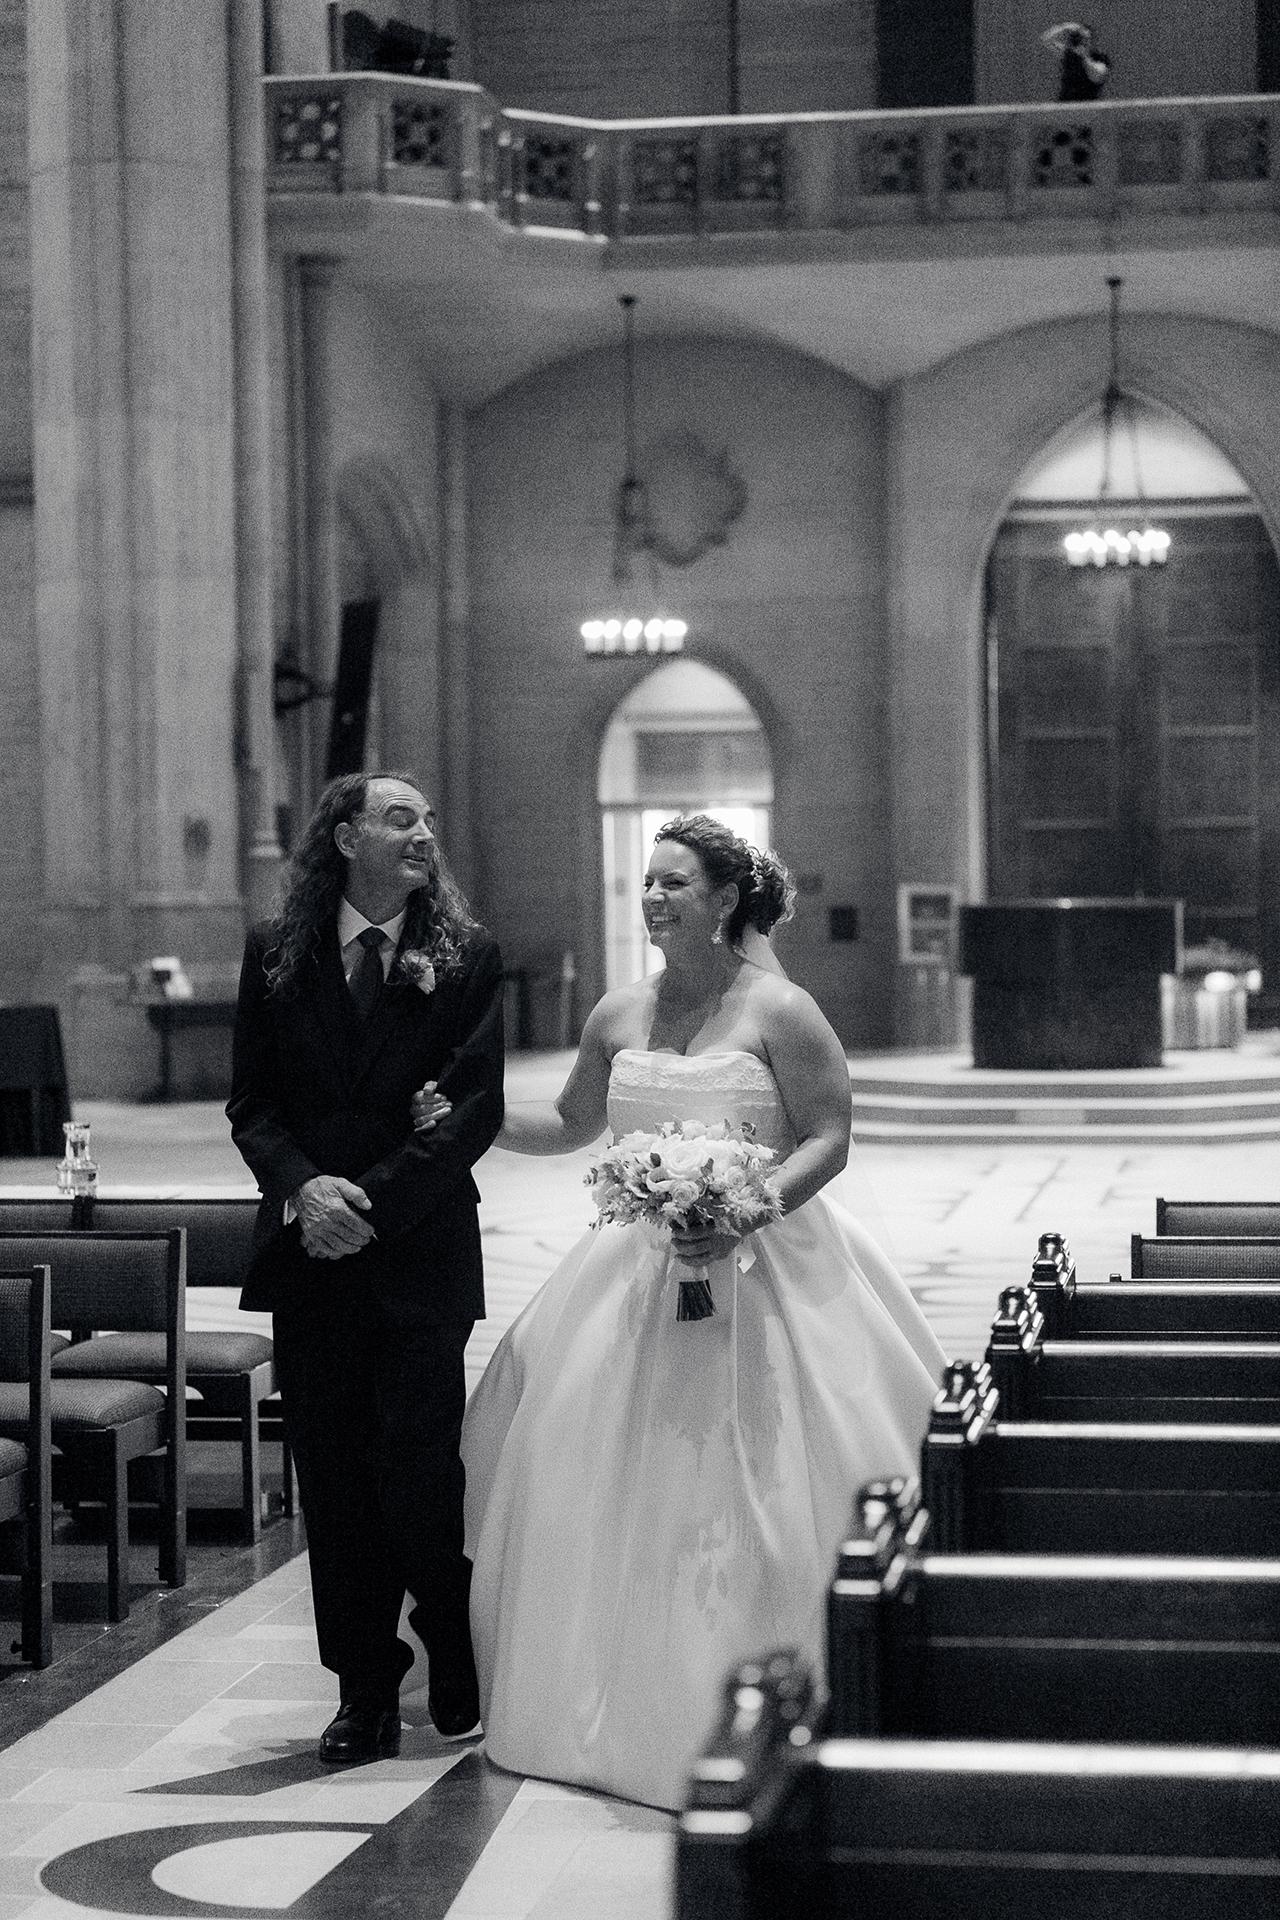 Grace_Cathedral_Tarra_Gallery_Wedding_011.jpg